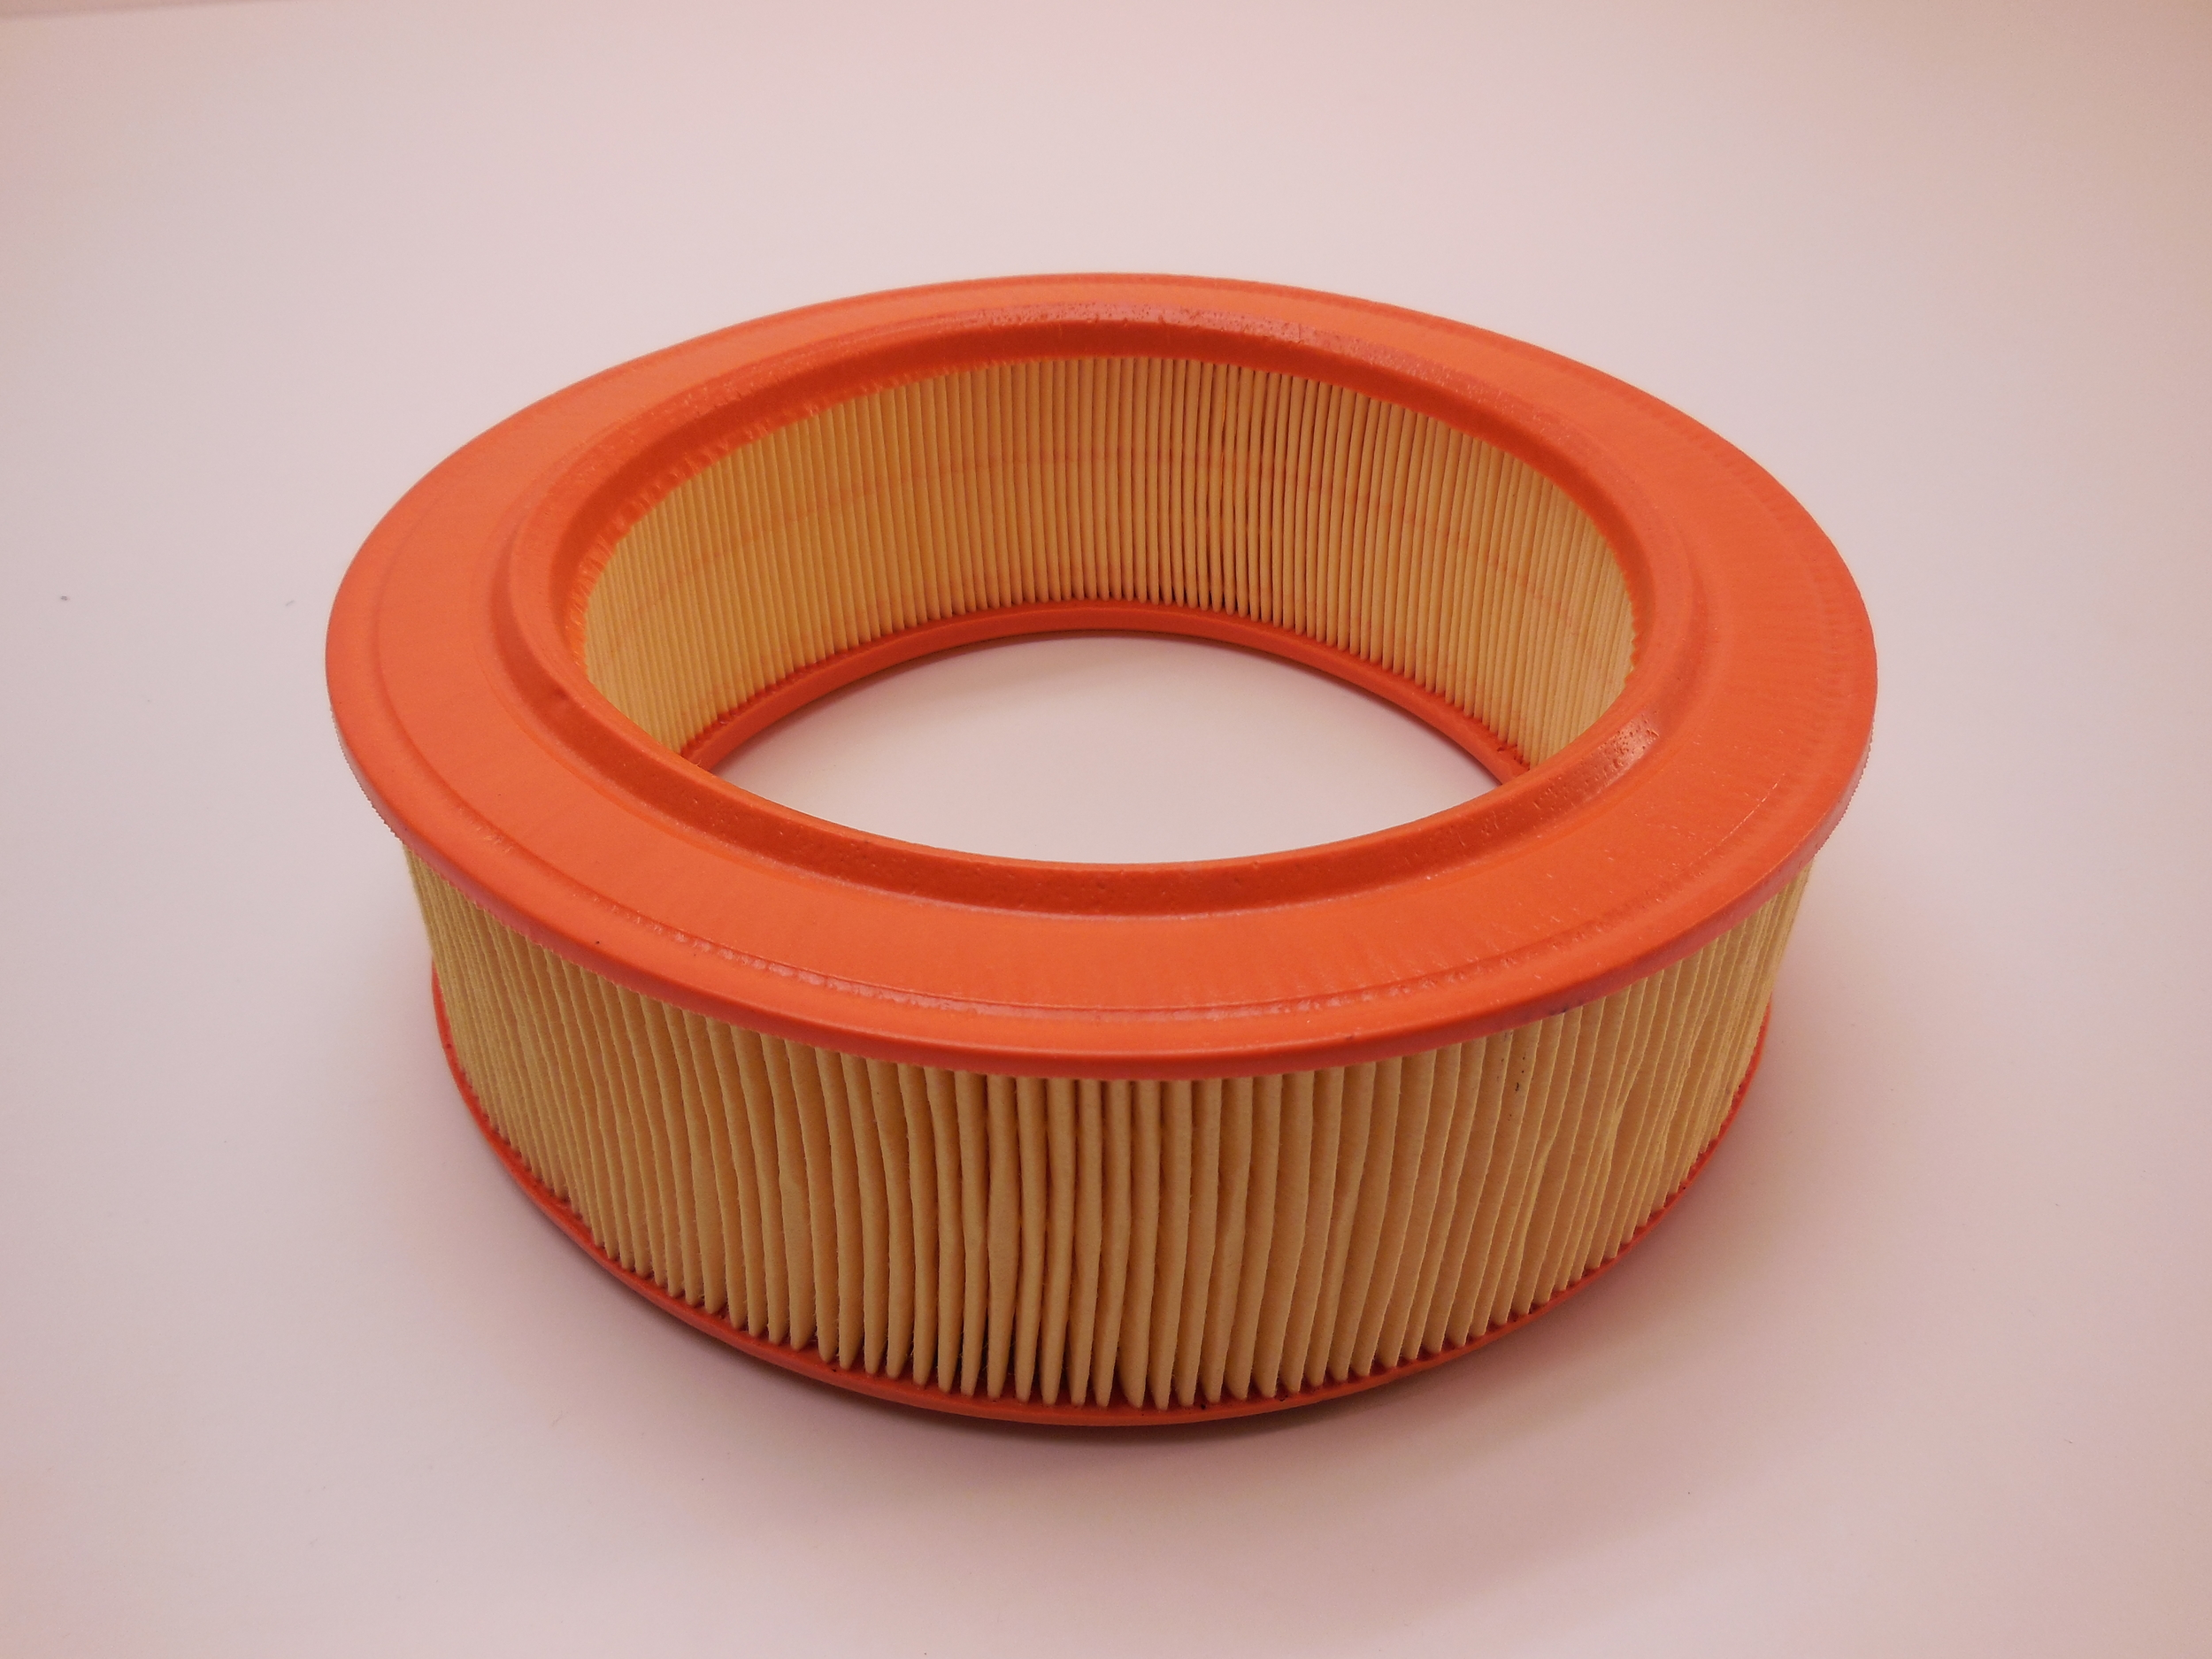 Air filter Häggo Nr: 453 7091-002 price: 349 sek